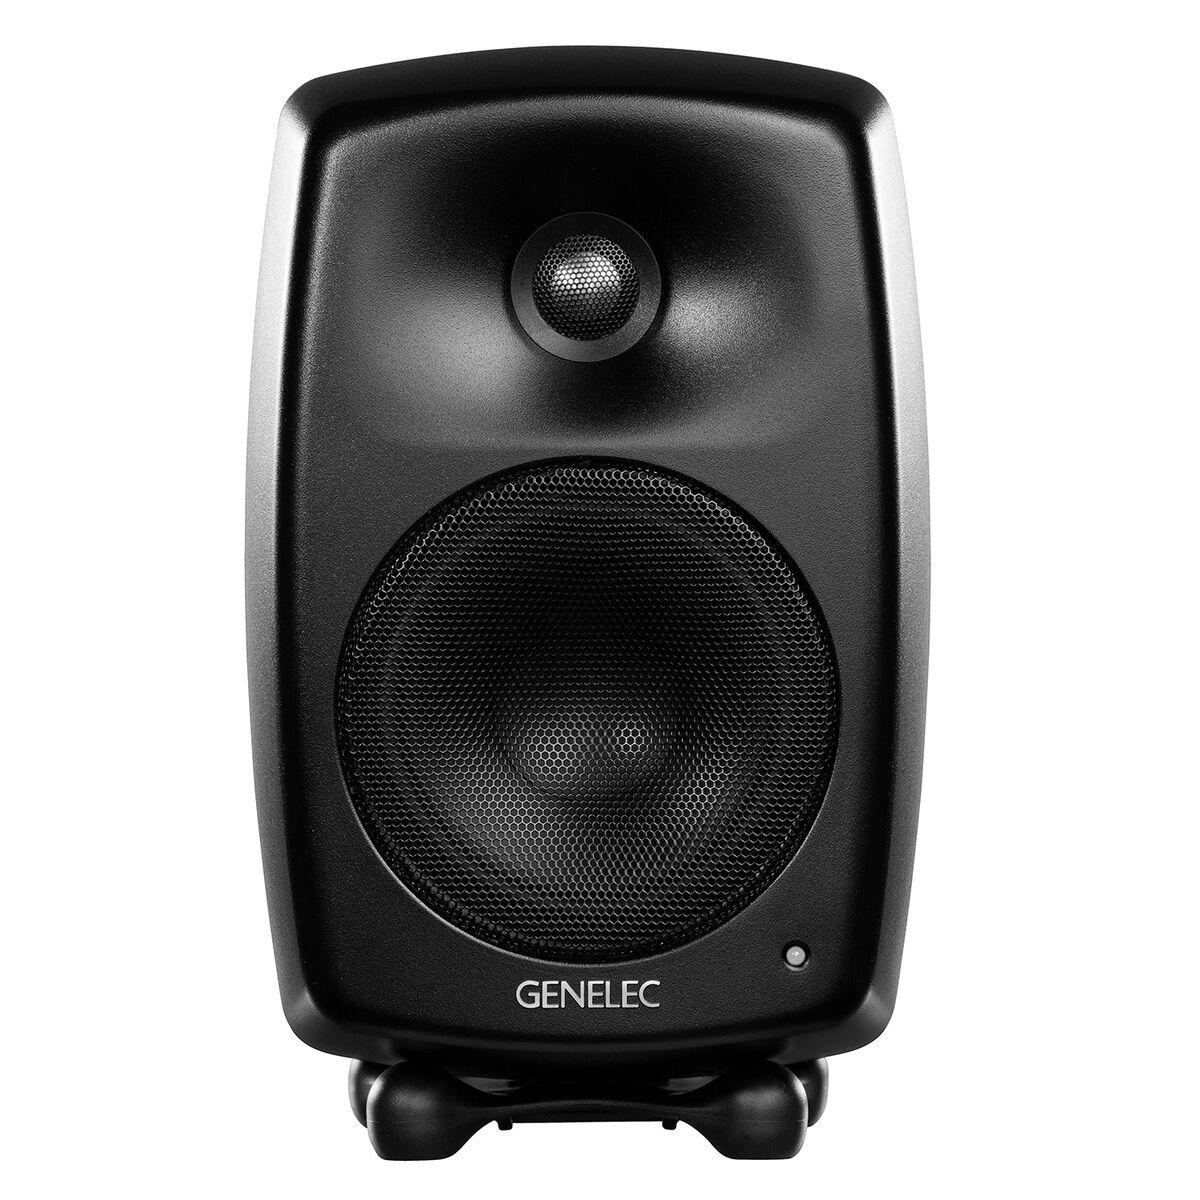 Genelec G Three (B) active speaker, black